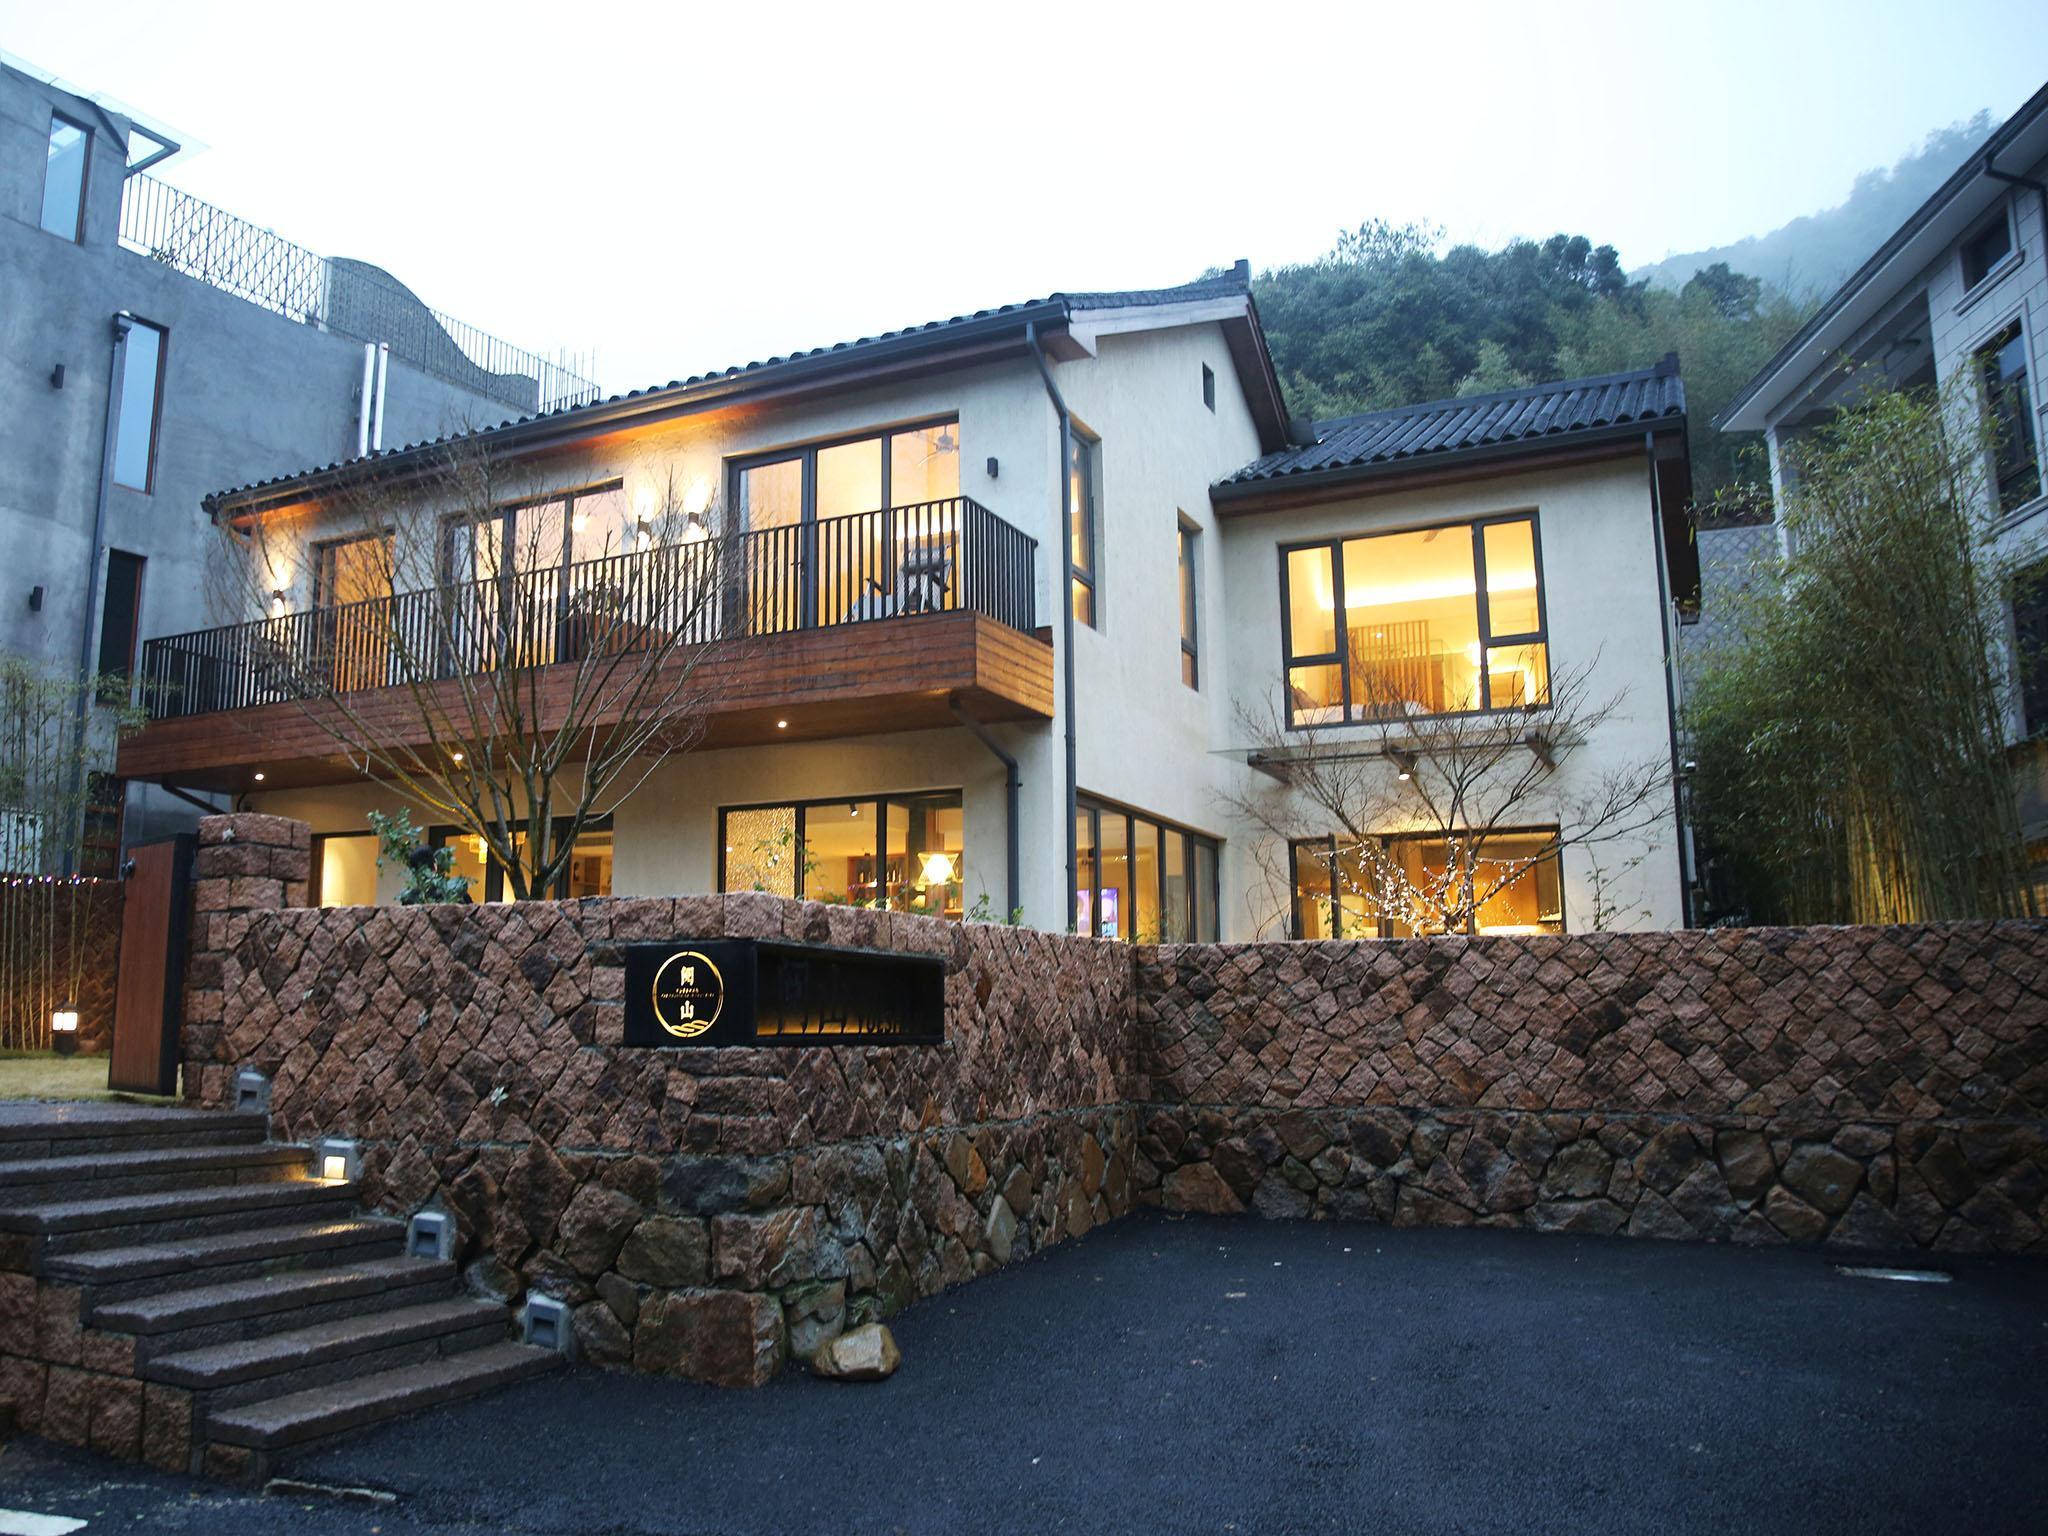 Moganshan Yinglun Yueshan Japanese Style Villa